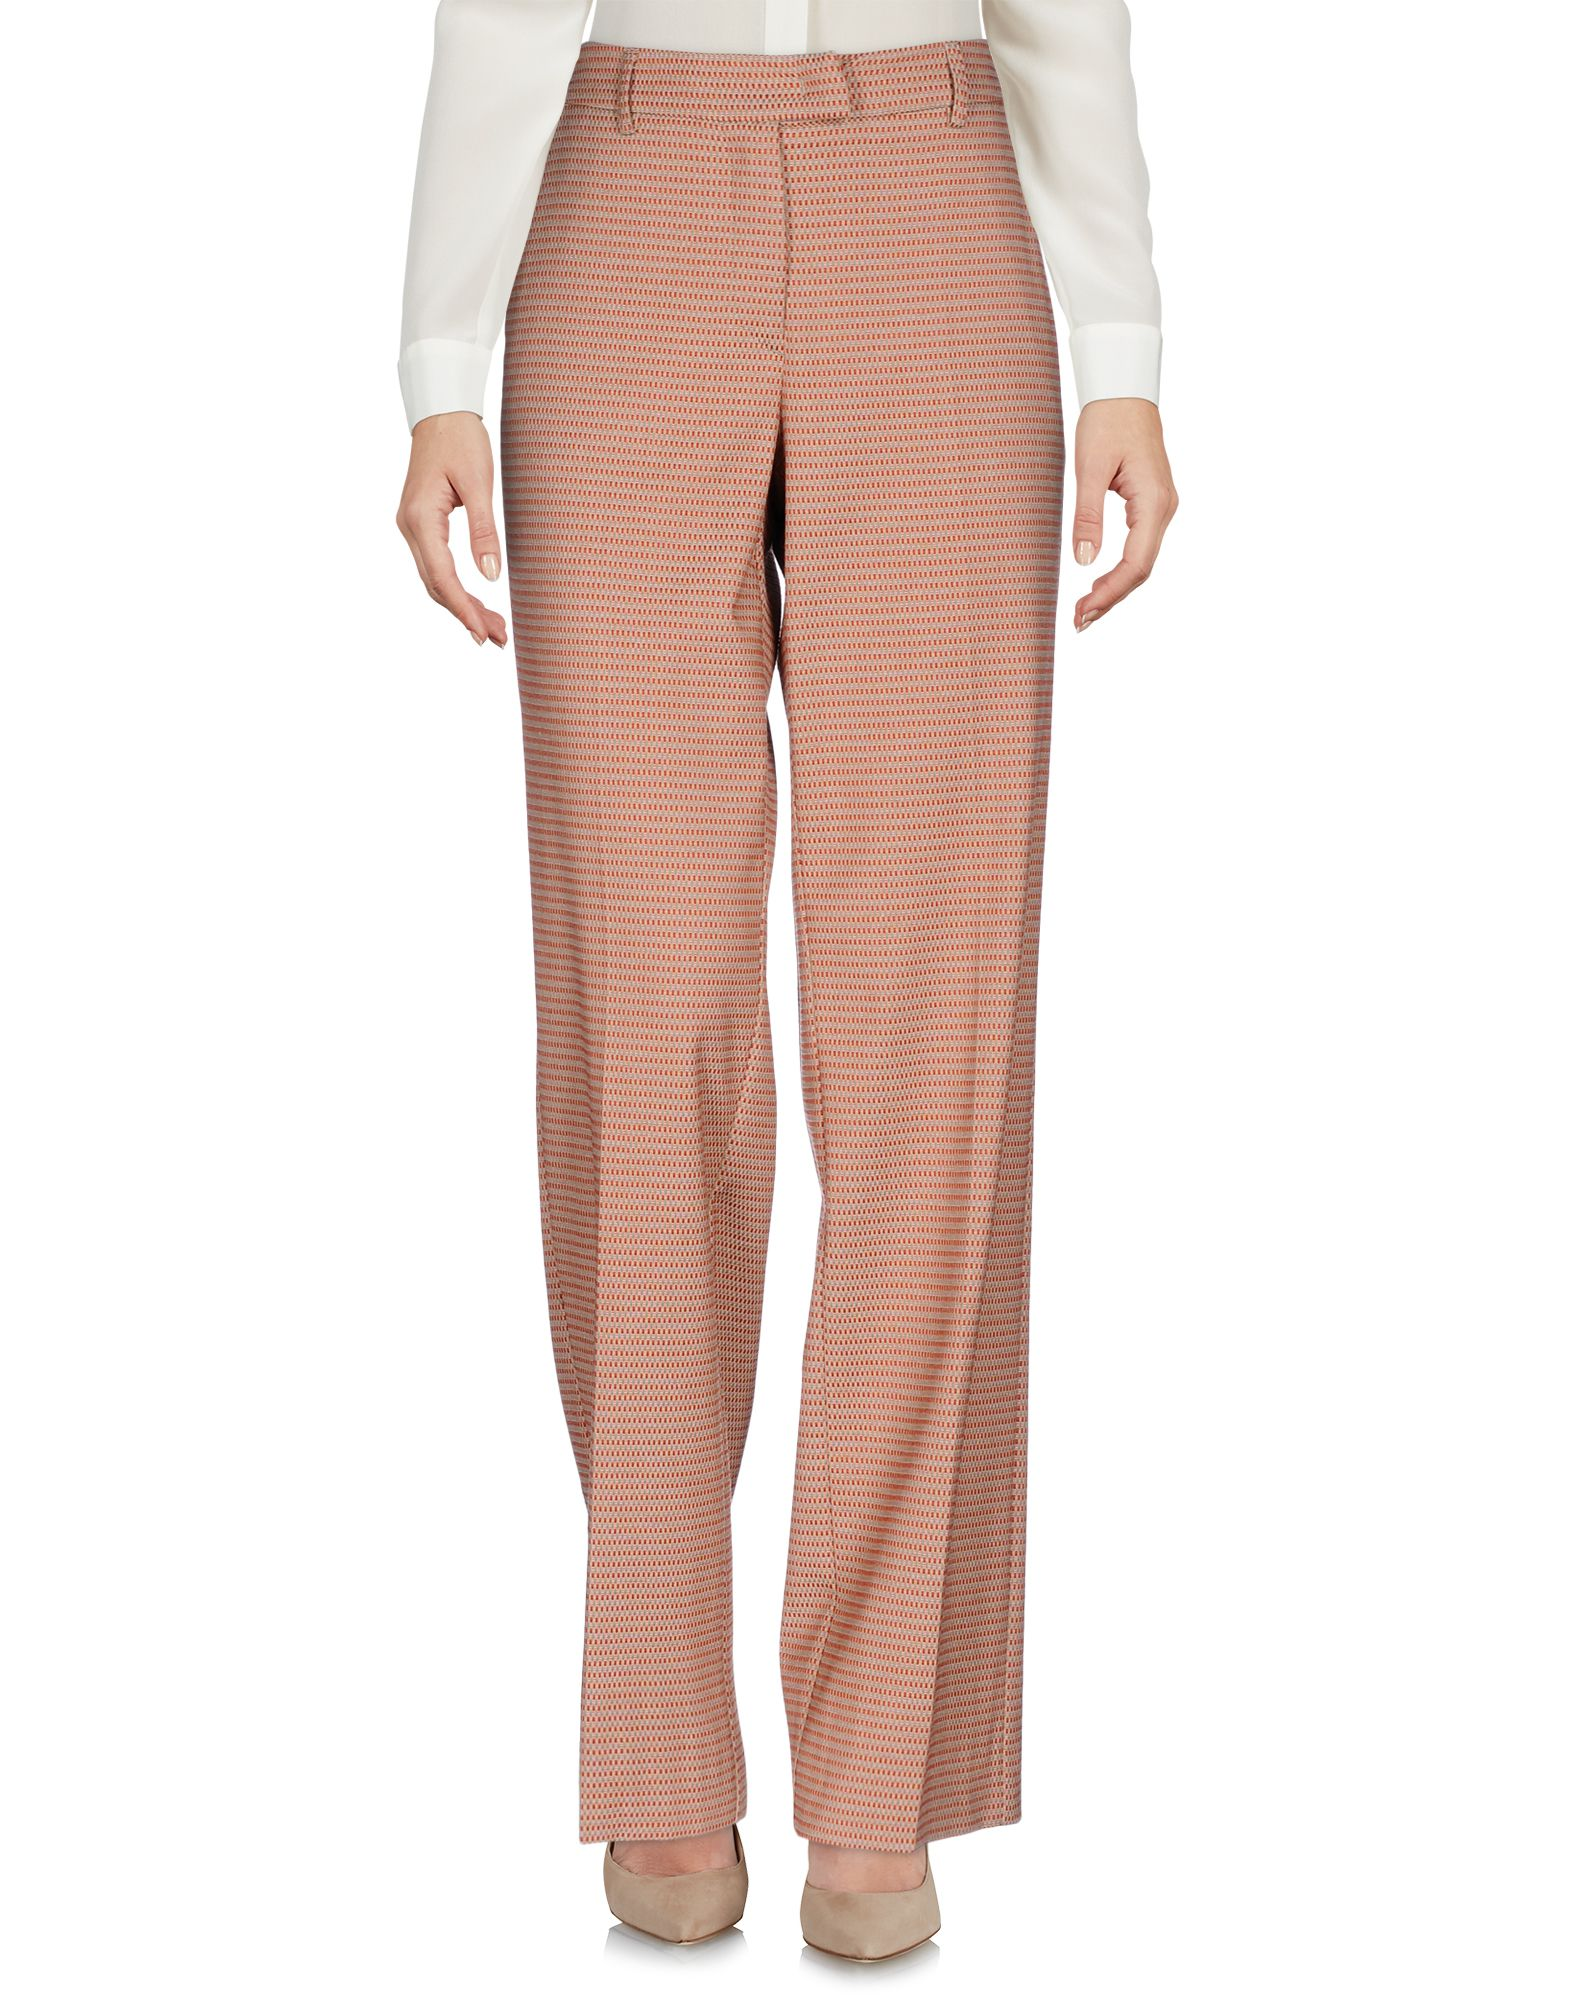 Pantalone Garage Nouveau Donna - Acquista online su R2tyrZ